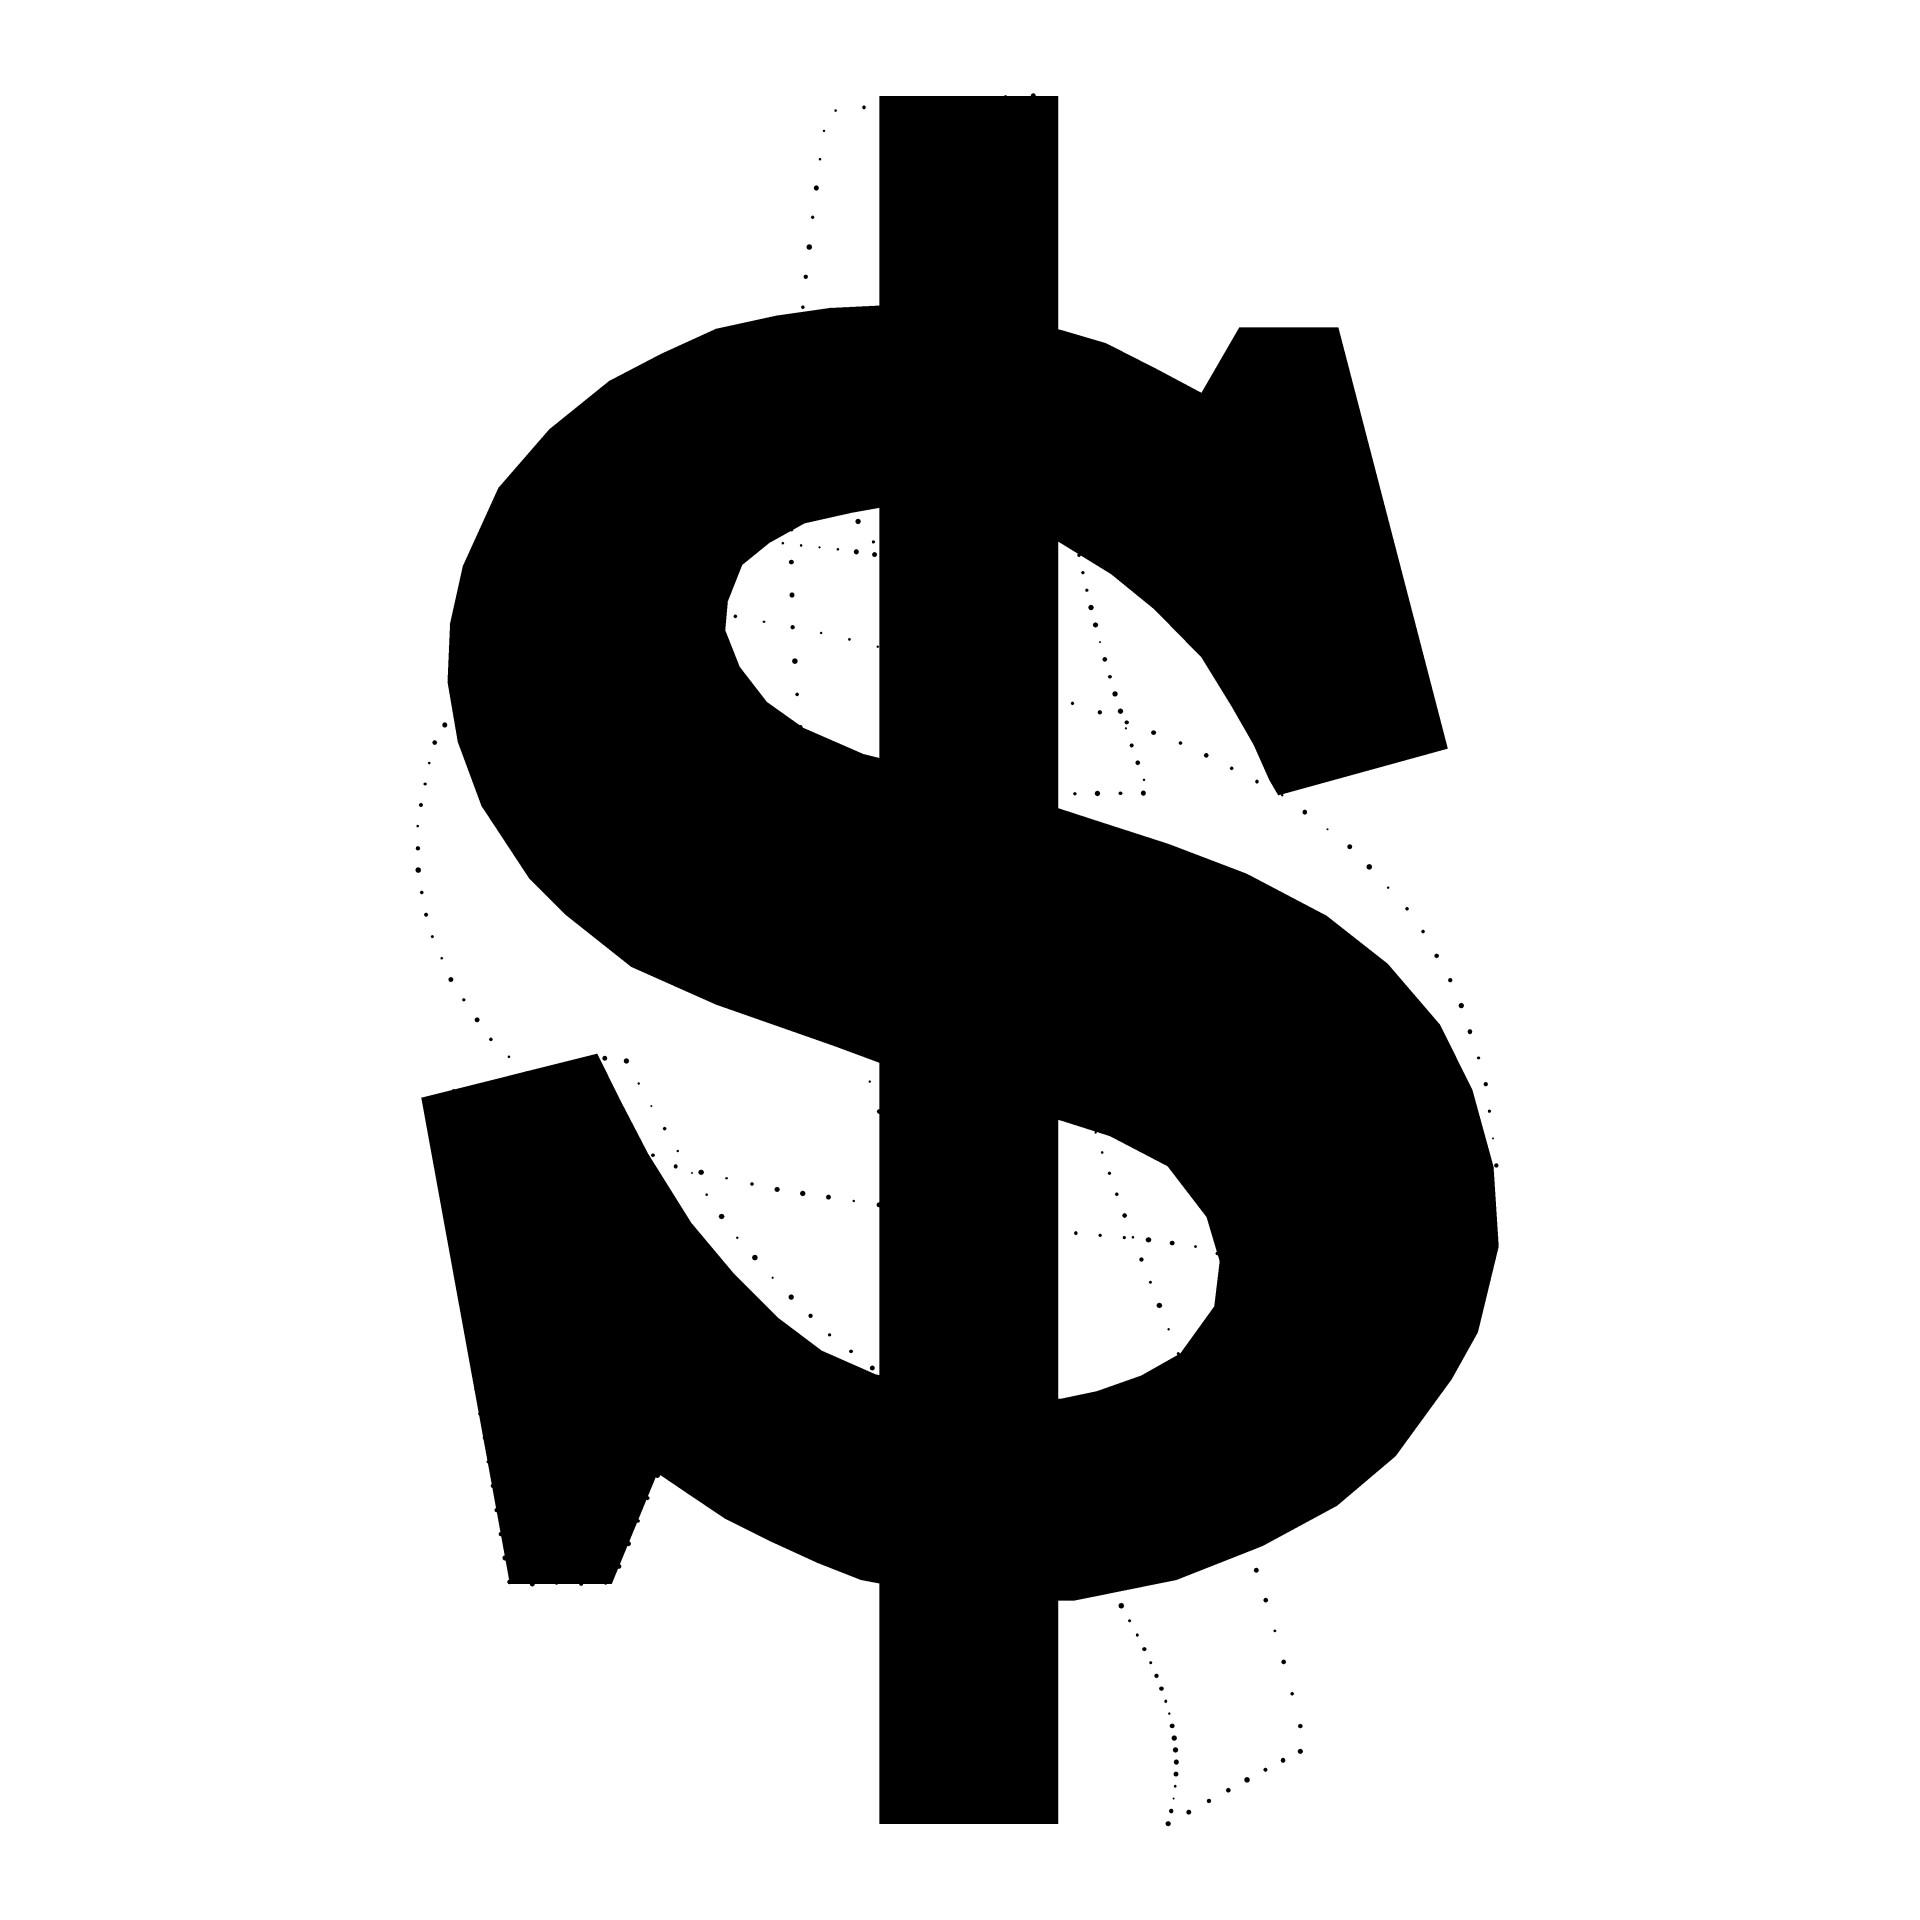 1920x1920 Dollar Sign Silhouette Free Stock Photo